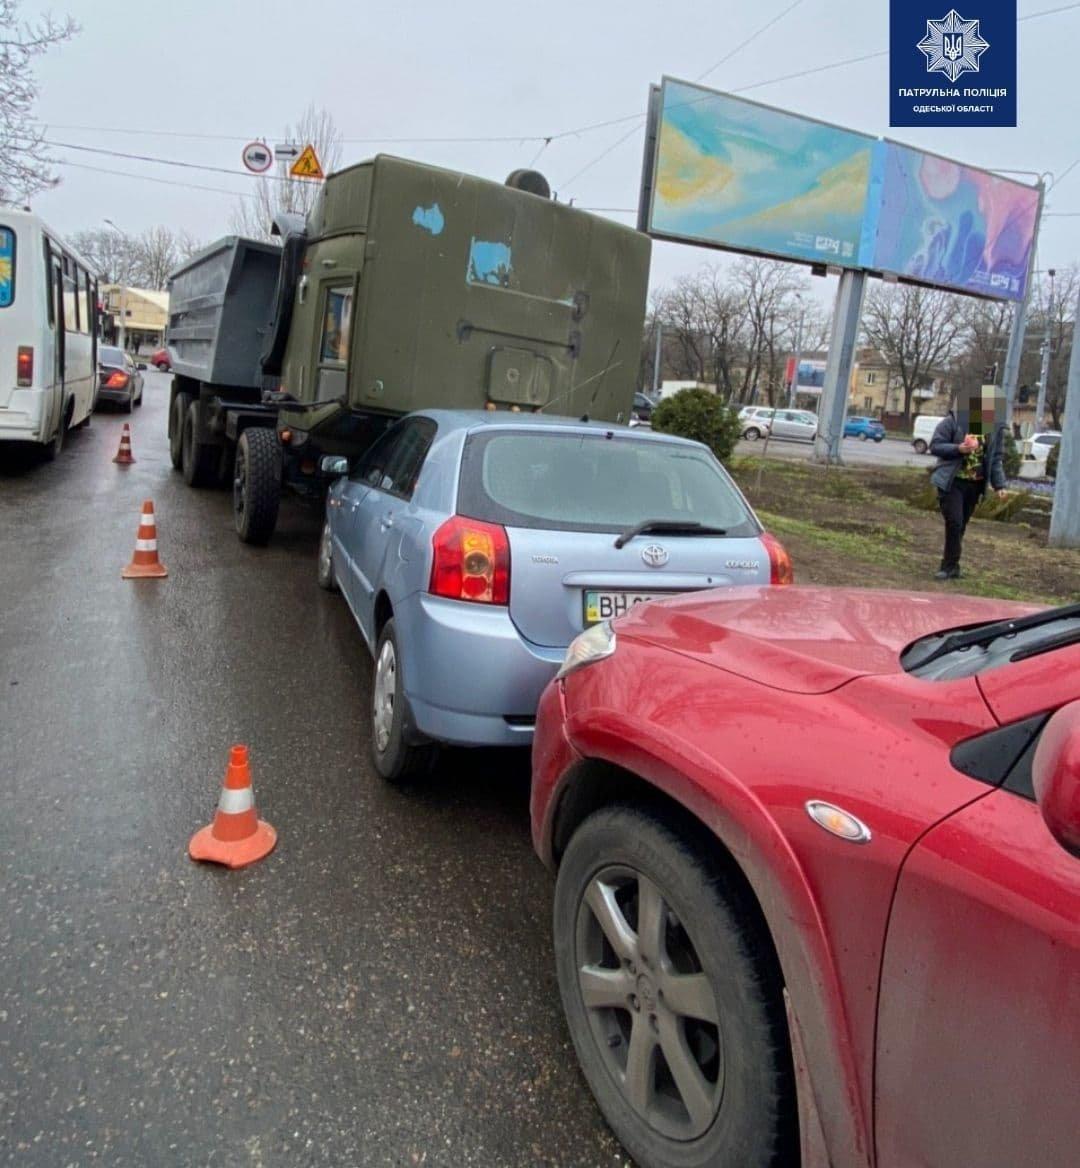 В Одессе произошло тройное ДТП, - ФОТО, фото-2